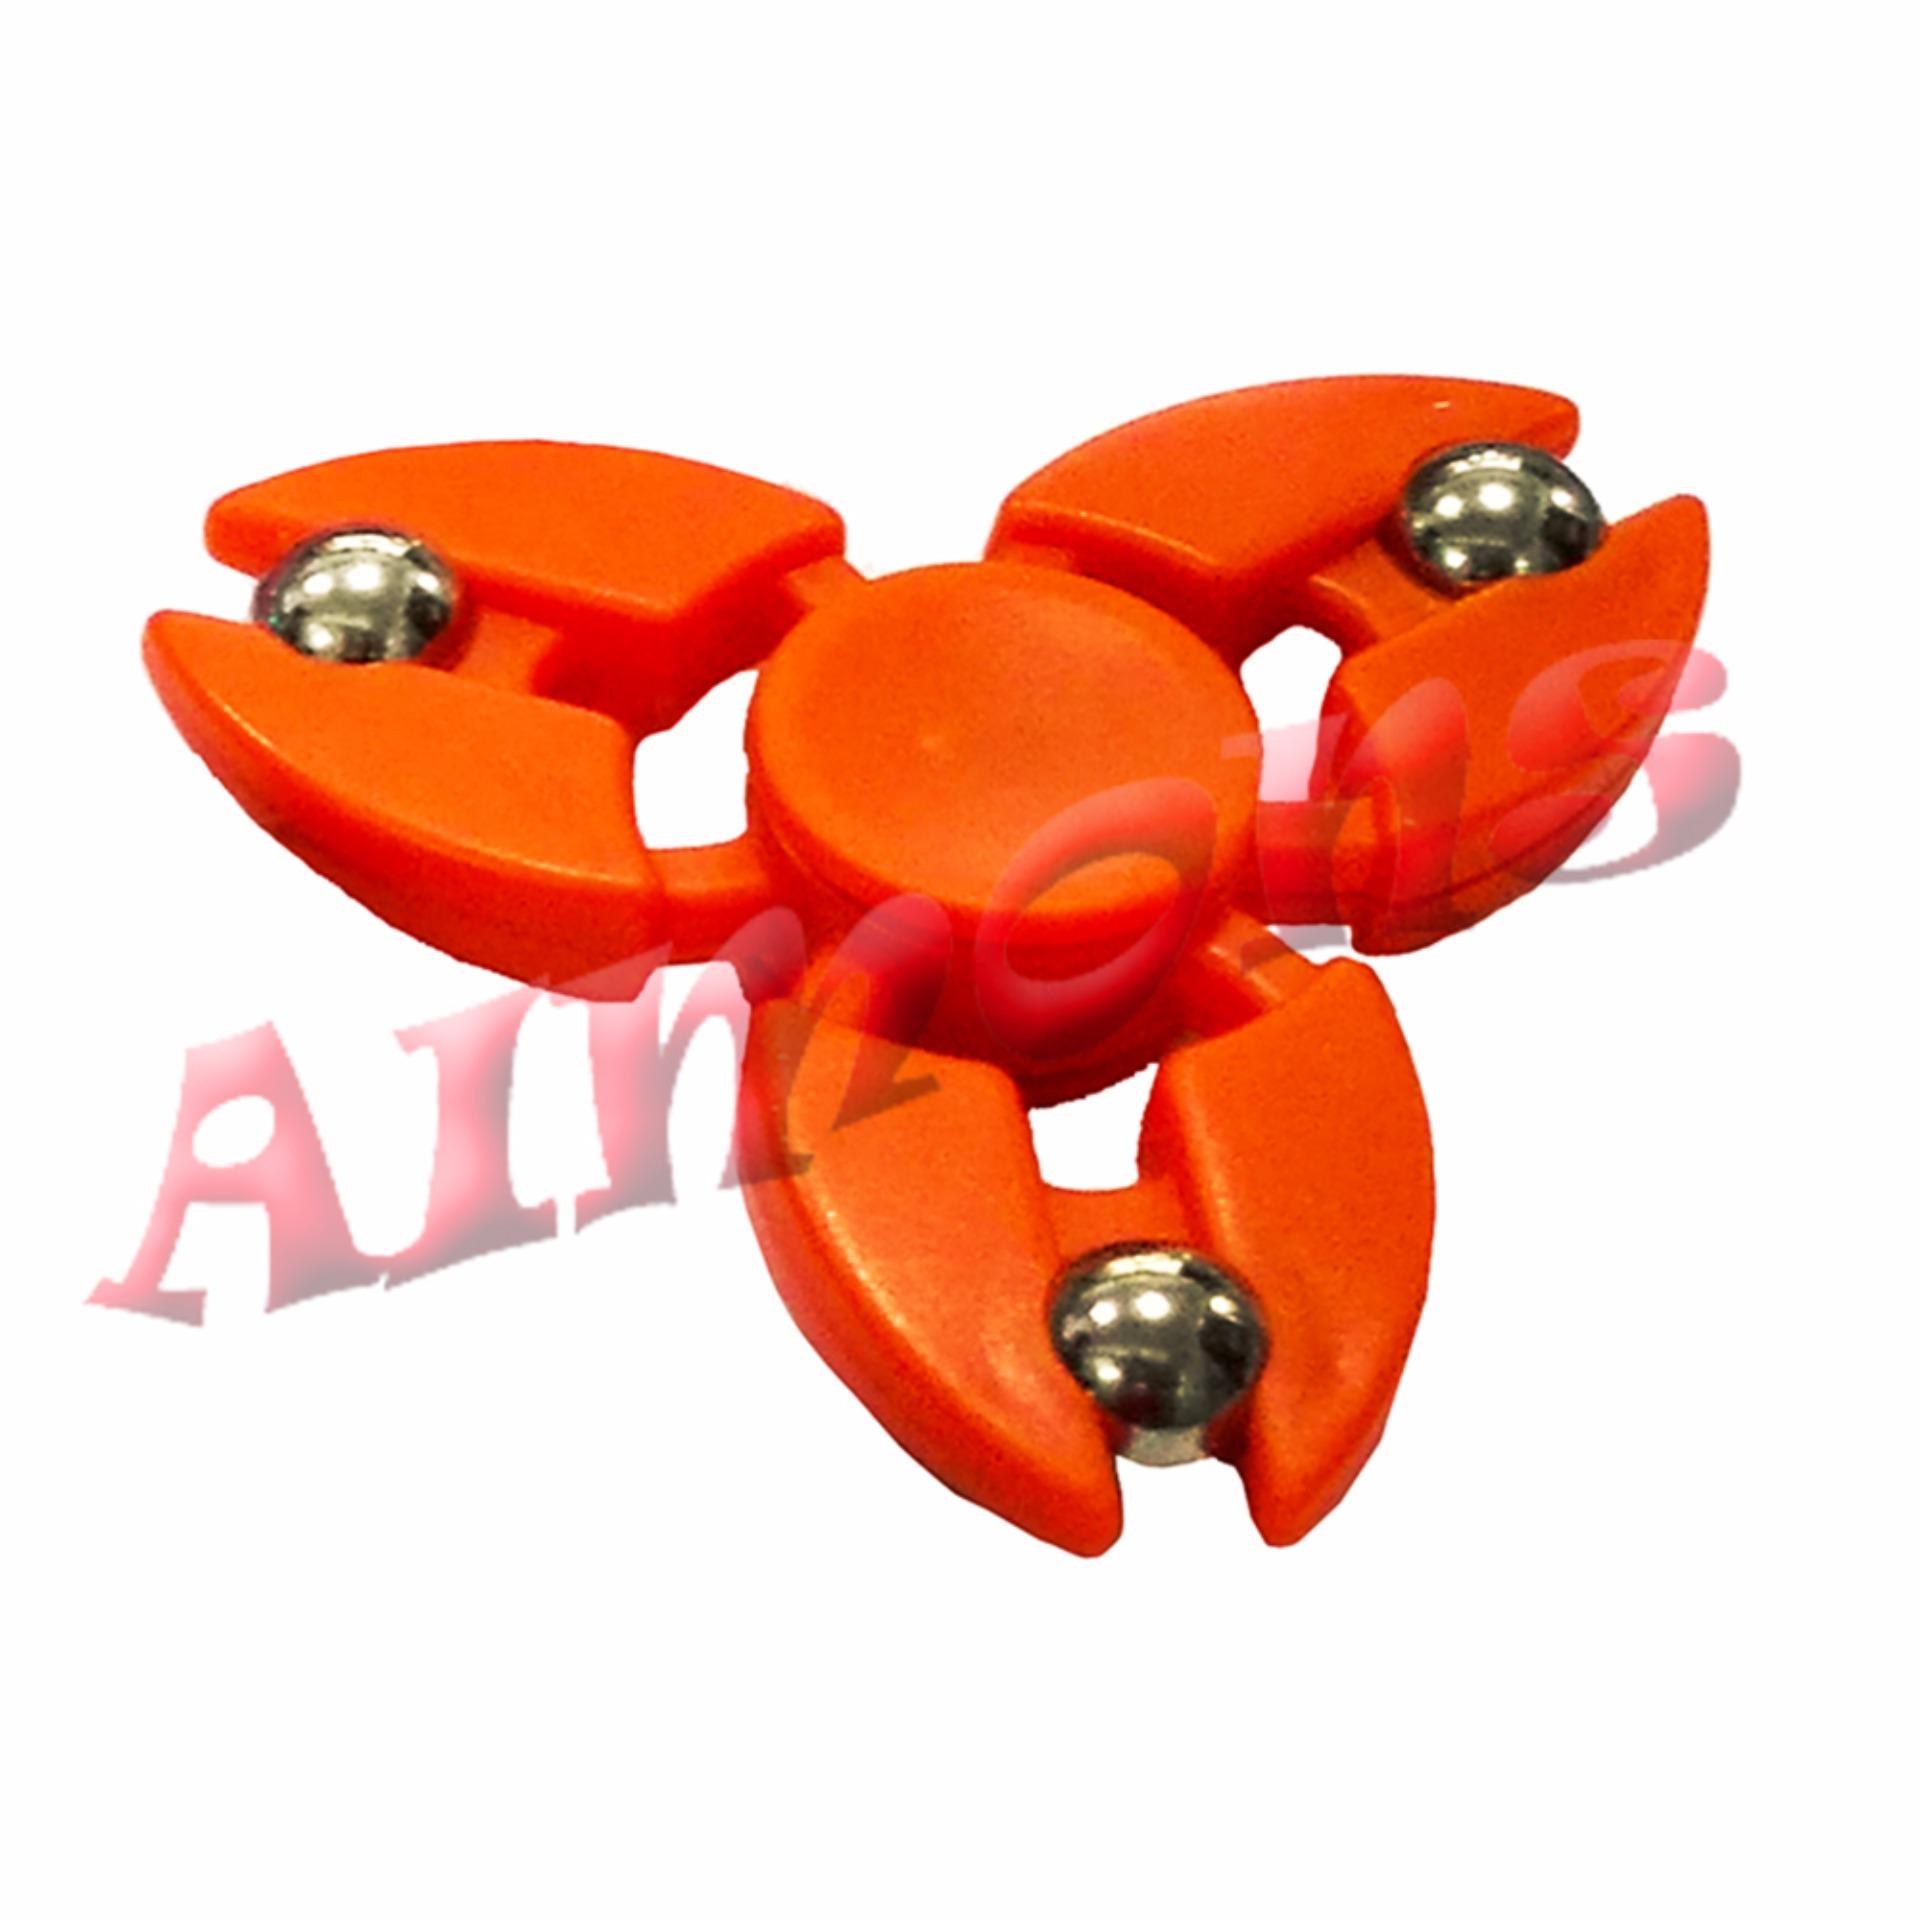 Belanja Terbaik Aimons Hand Fidget Spinner Model Suriken Focus Toys With Led Games Mainan Tangan Random Colour